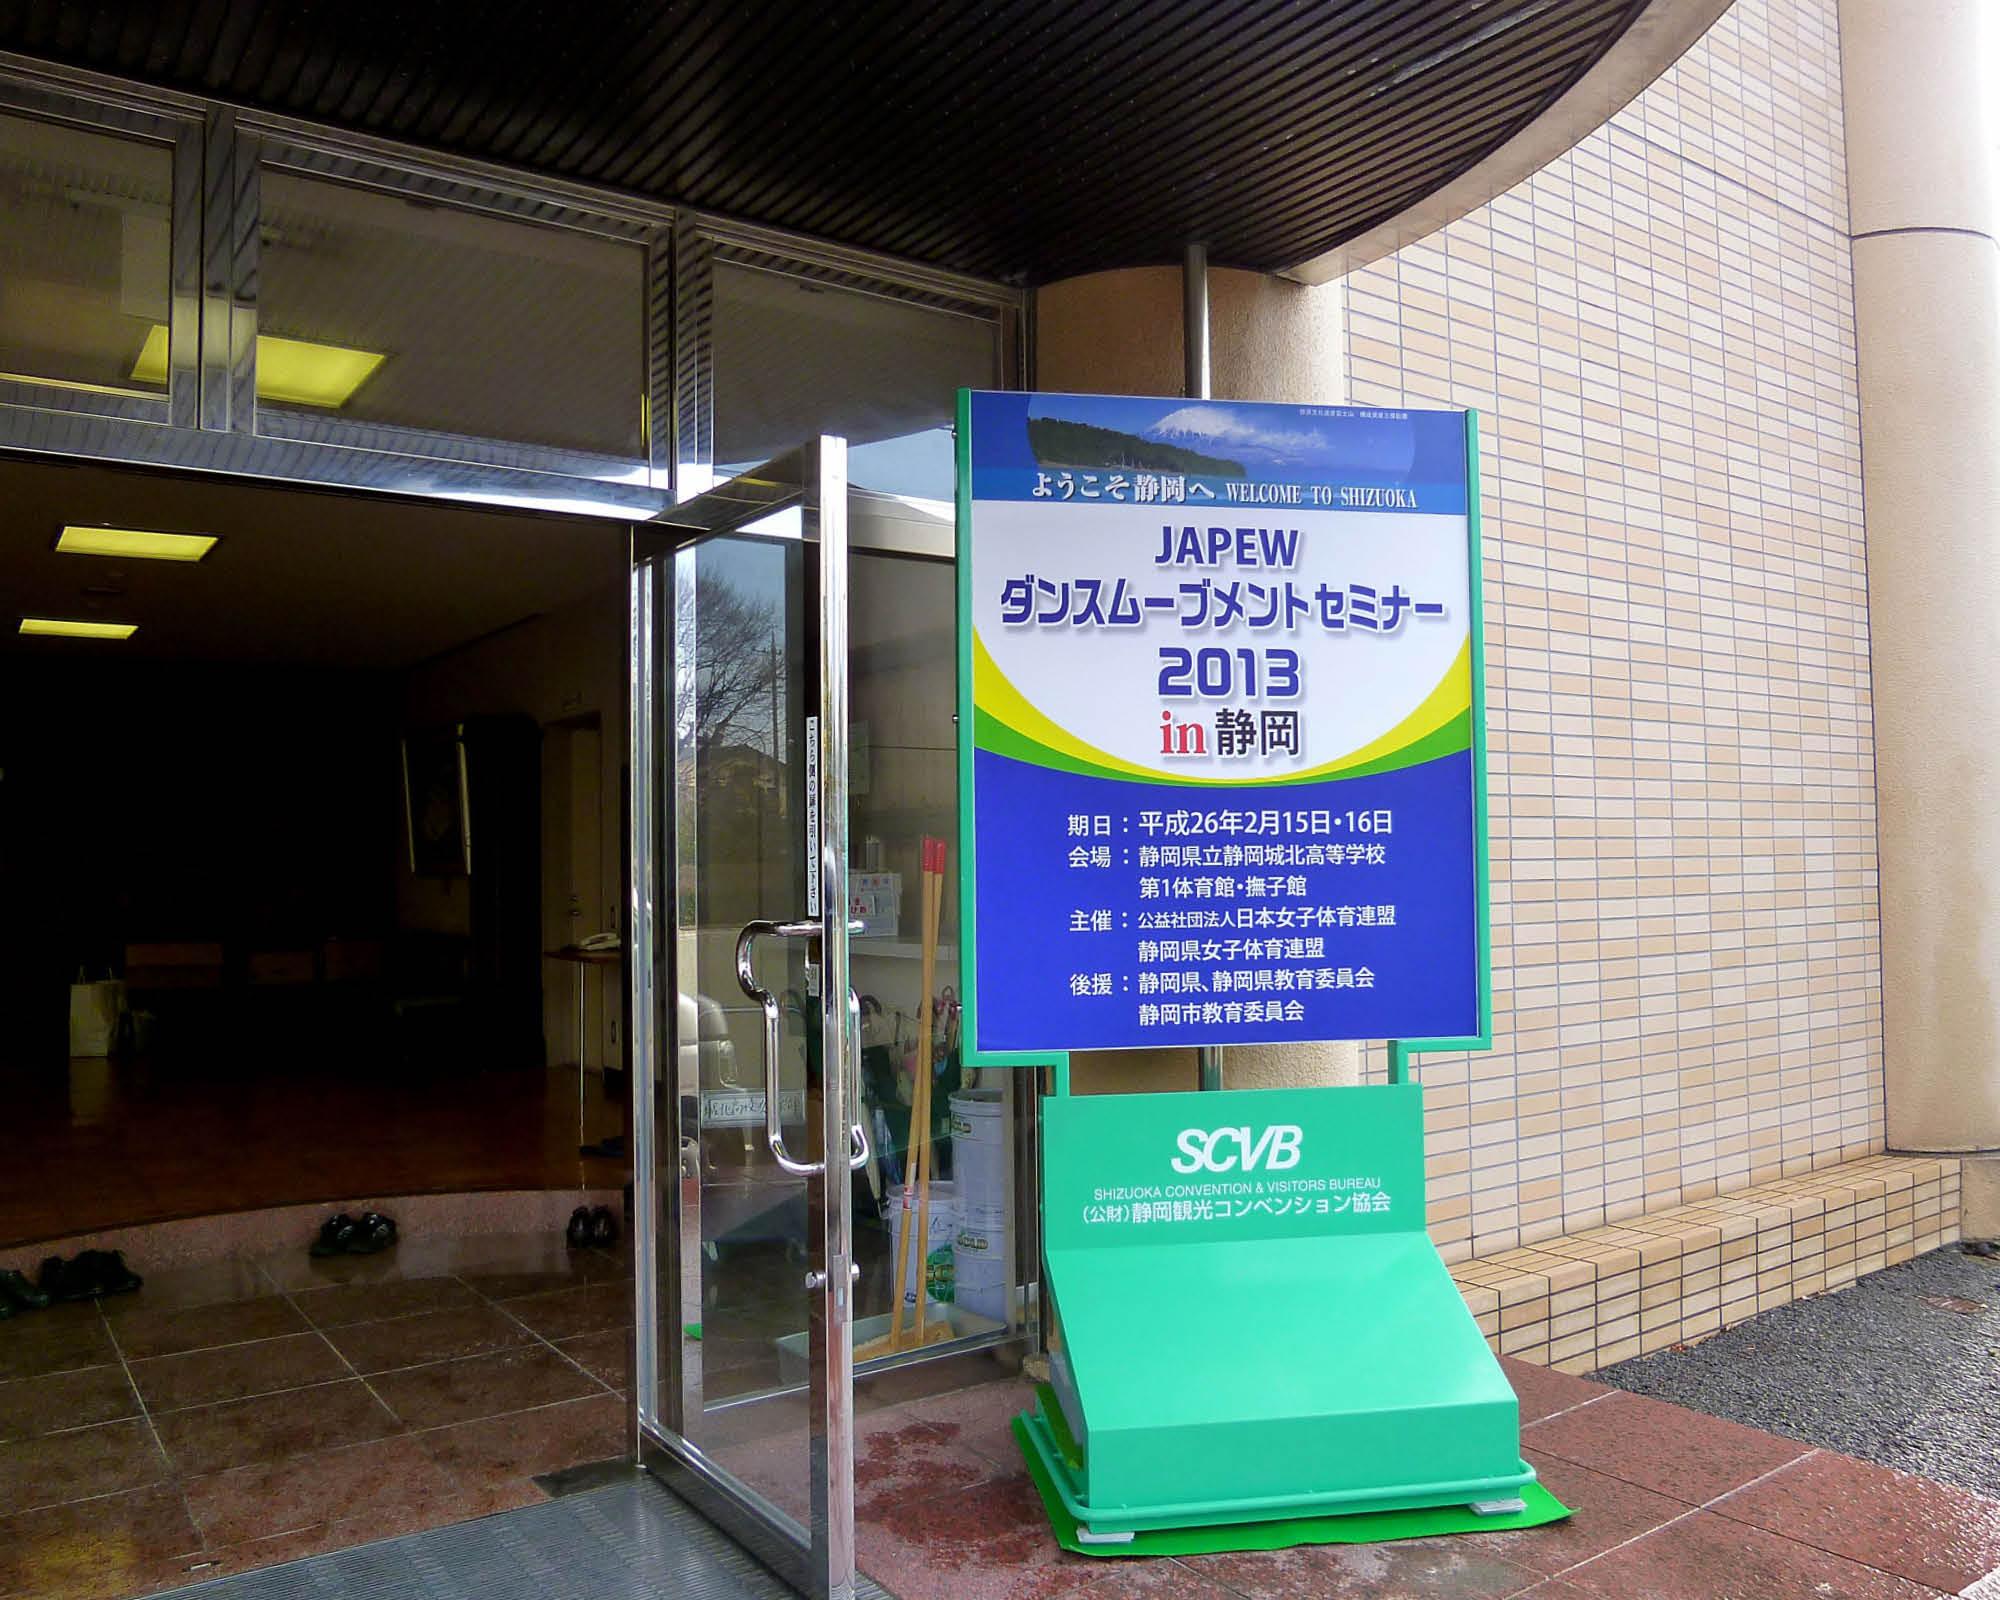 https://www.shizuoka-cb.com/wp-content/uploads/2021/03/photo-supports12.jpg